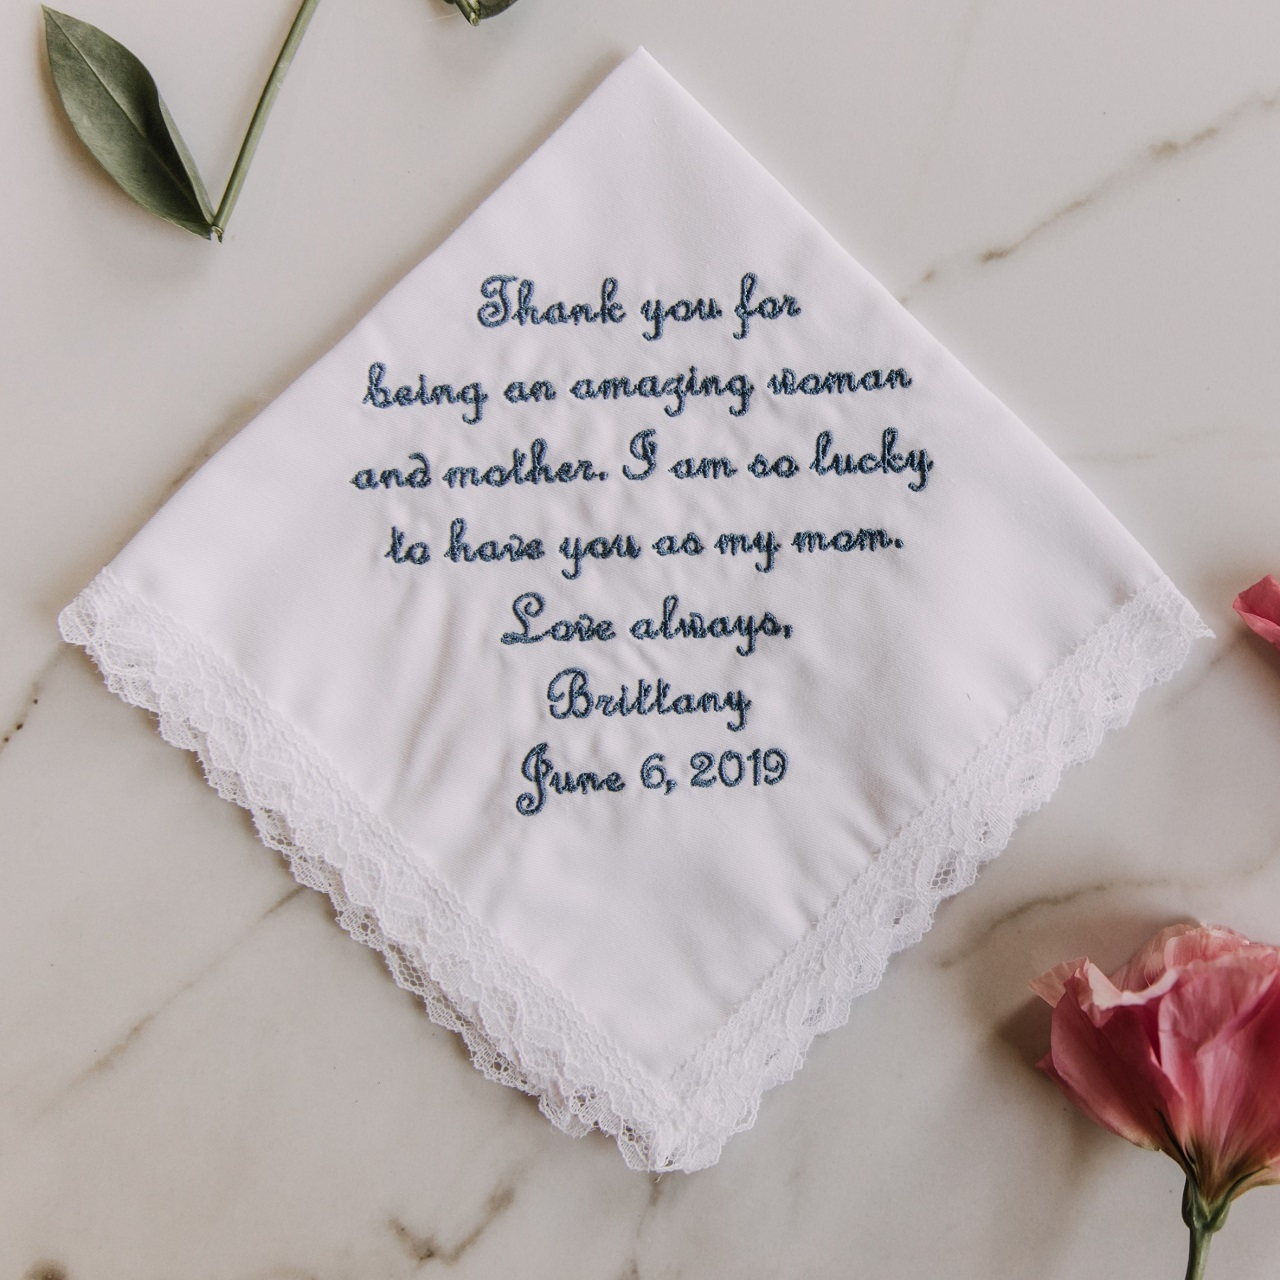 best personalized gift ideas hankerchief